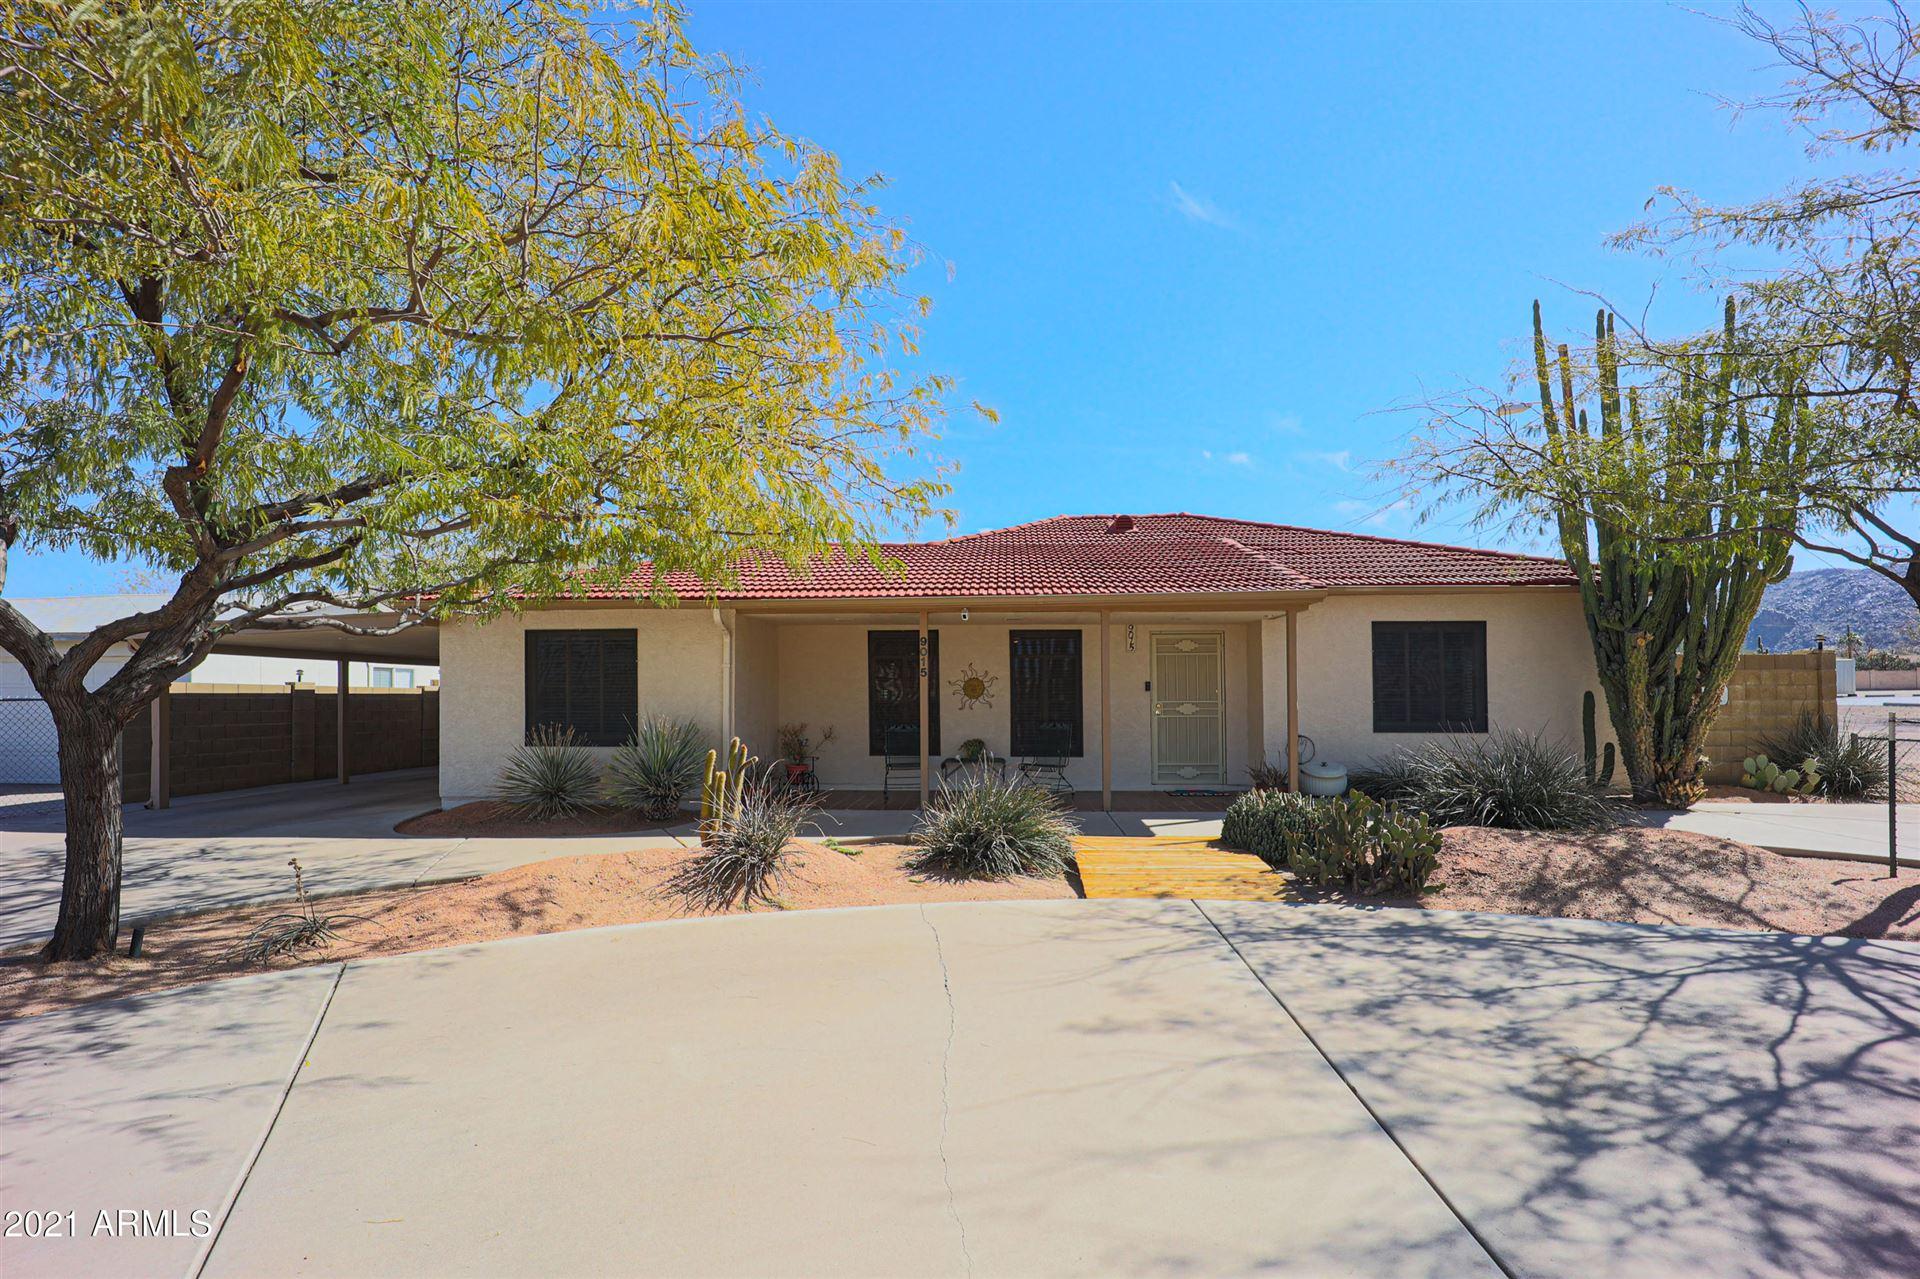 9015 S 7TH Avenue, Phoenix, AZ 85041 - MLS#: 6201554